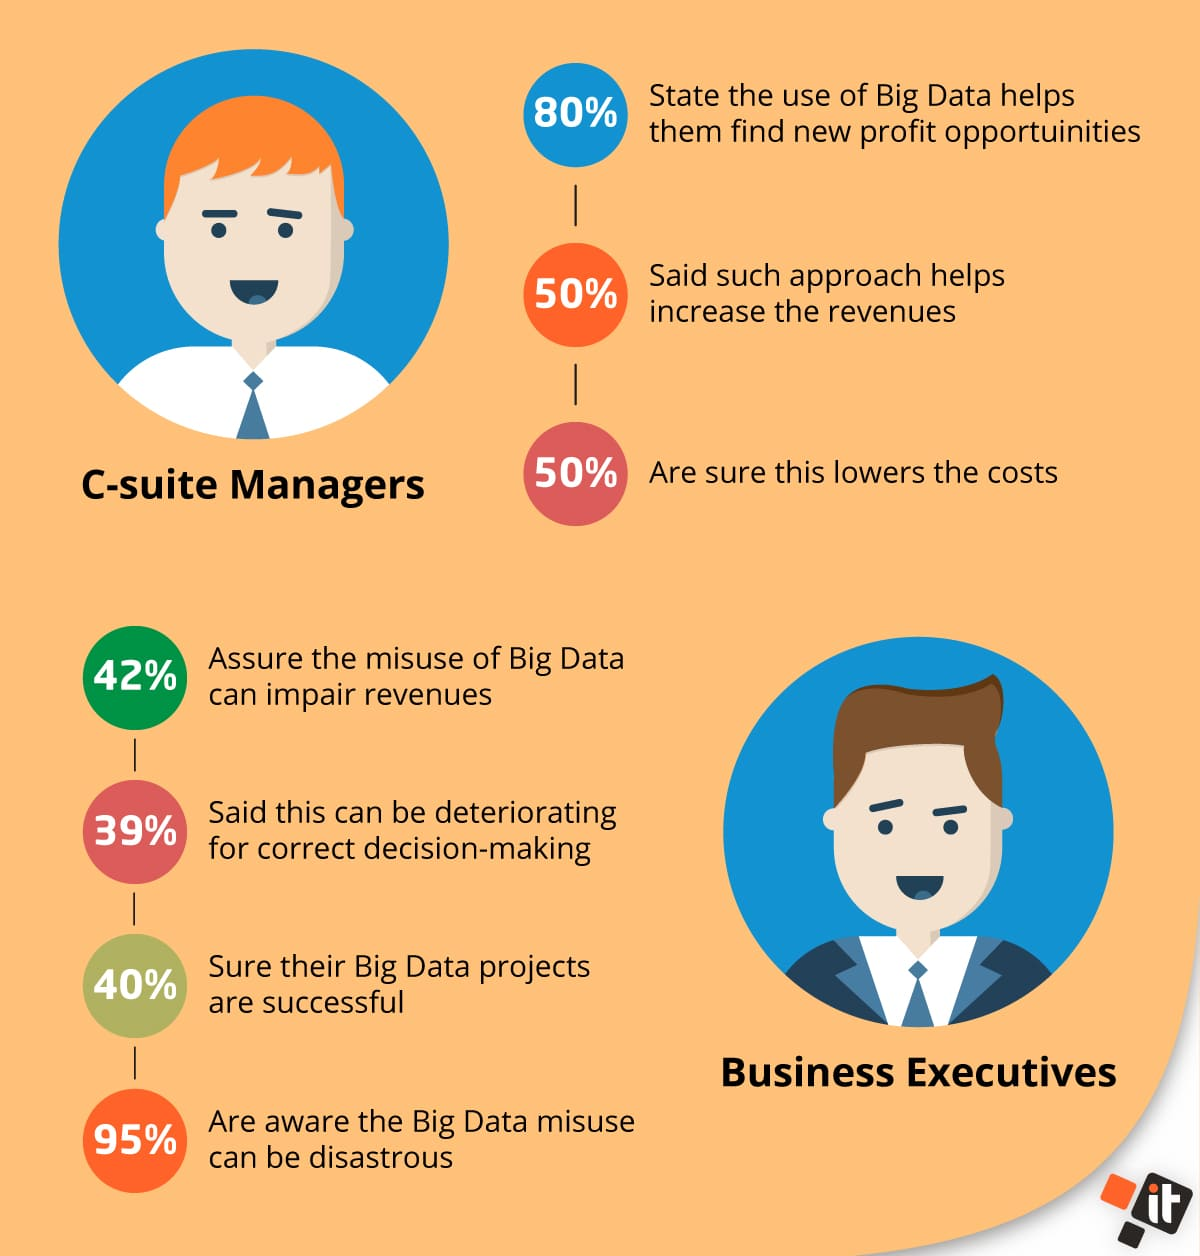 Big_Data_Misuse_Break_Business_ITSvit_2.jpg